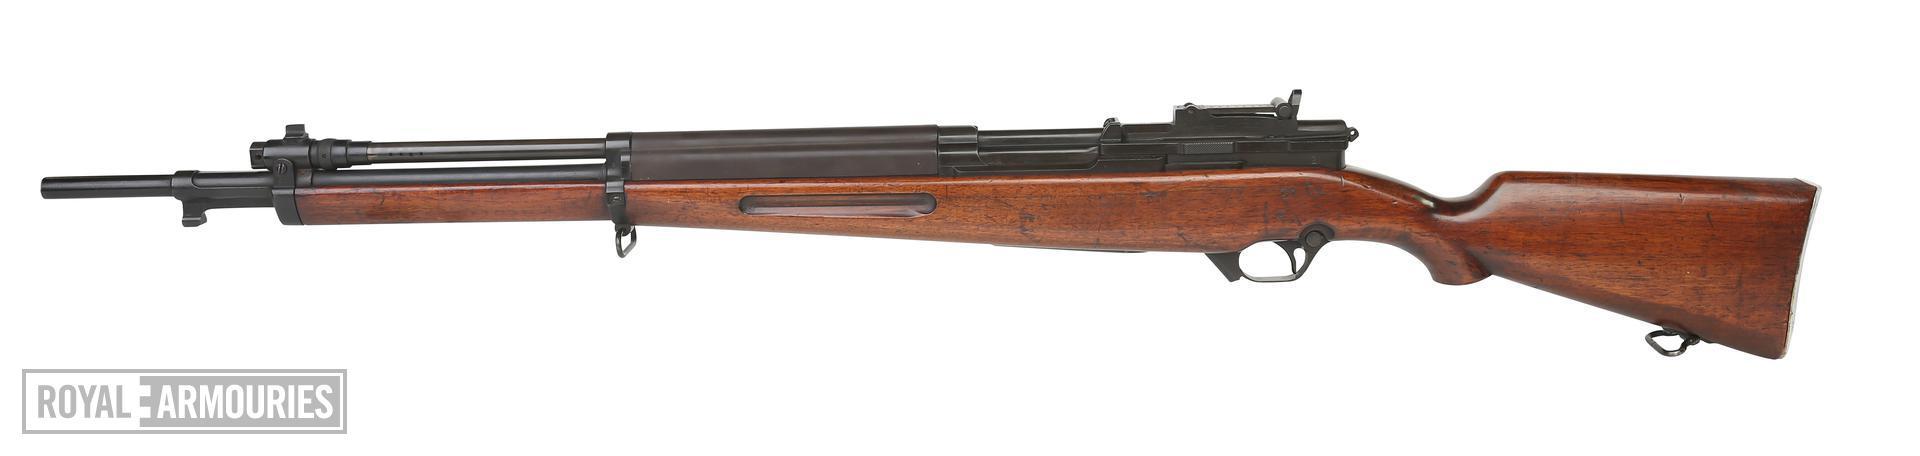 Centrefire self-loading rifle - Experimental Saive SLEM-1